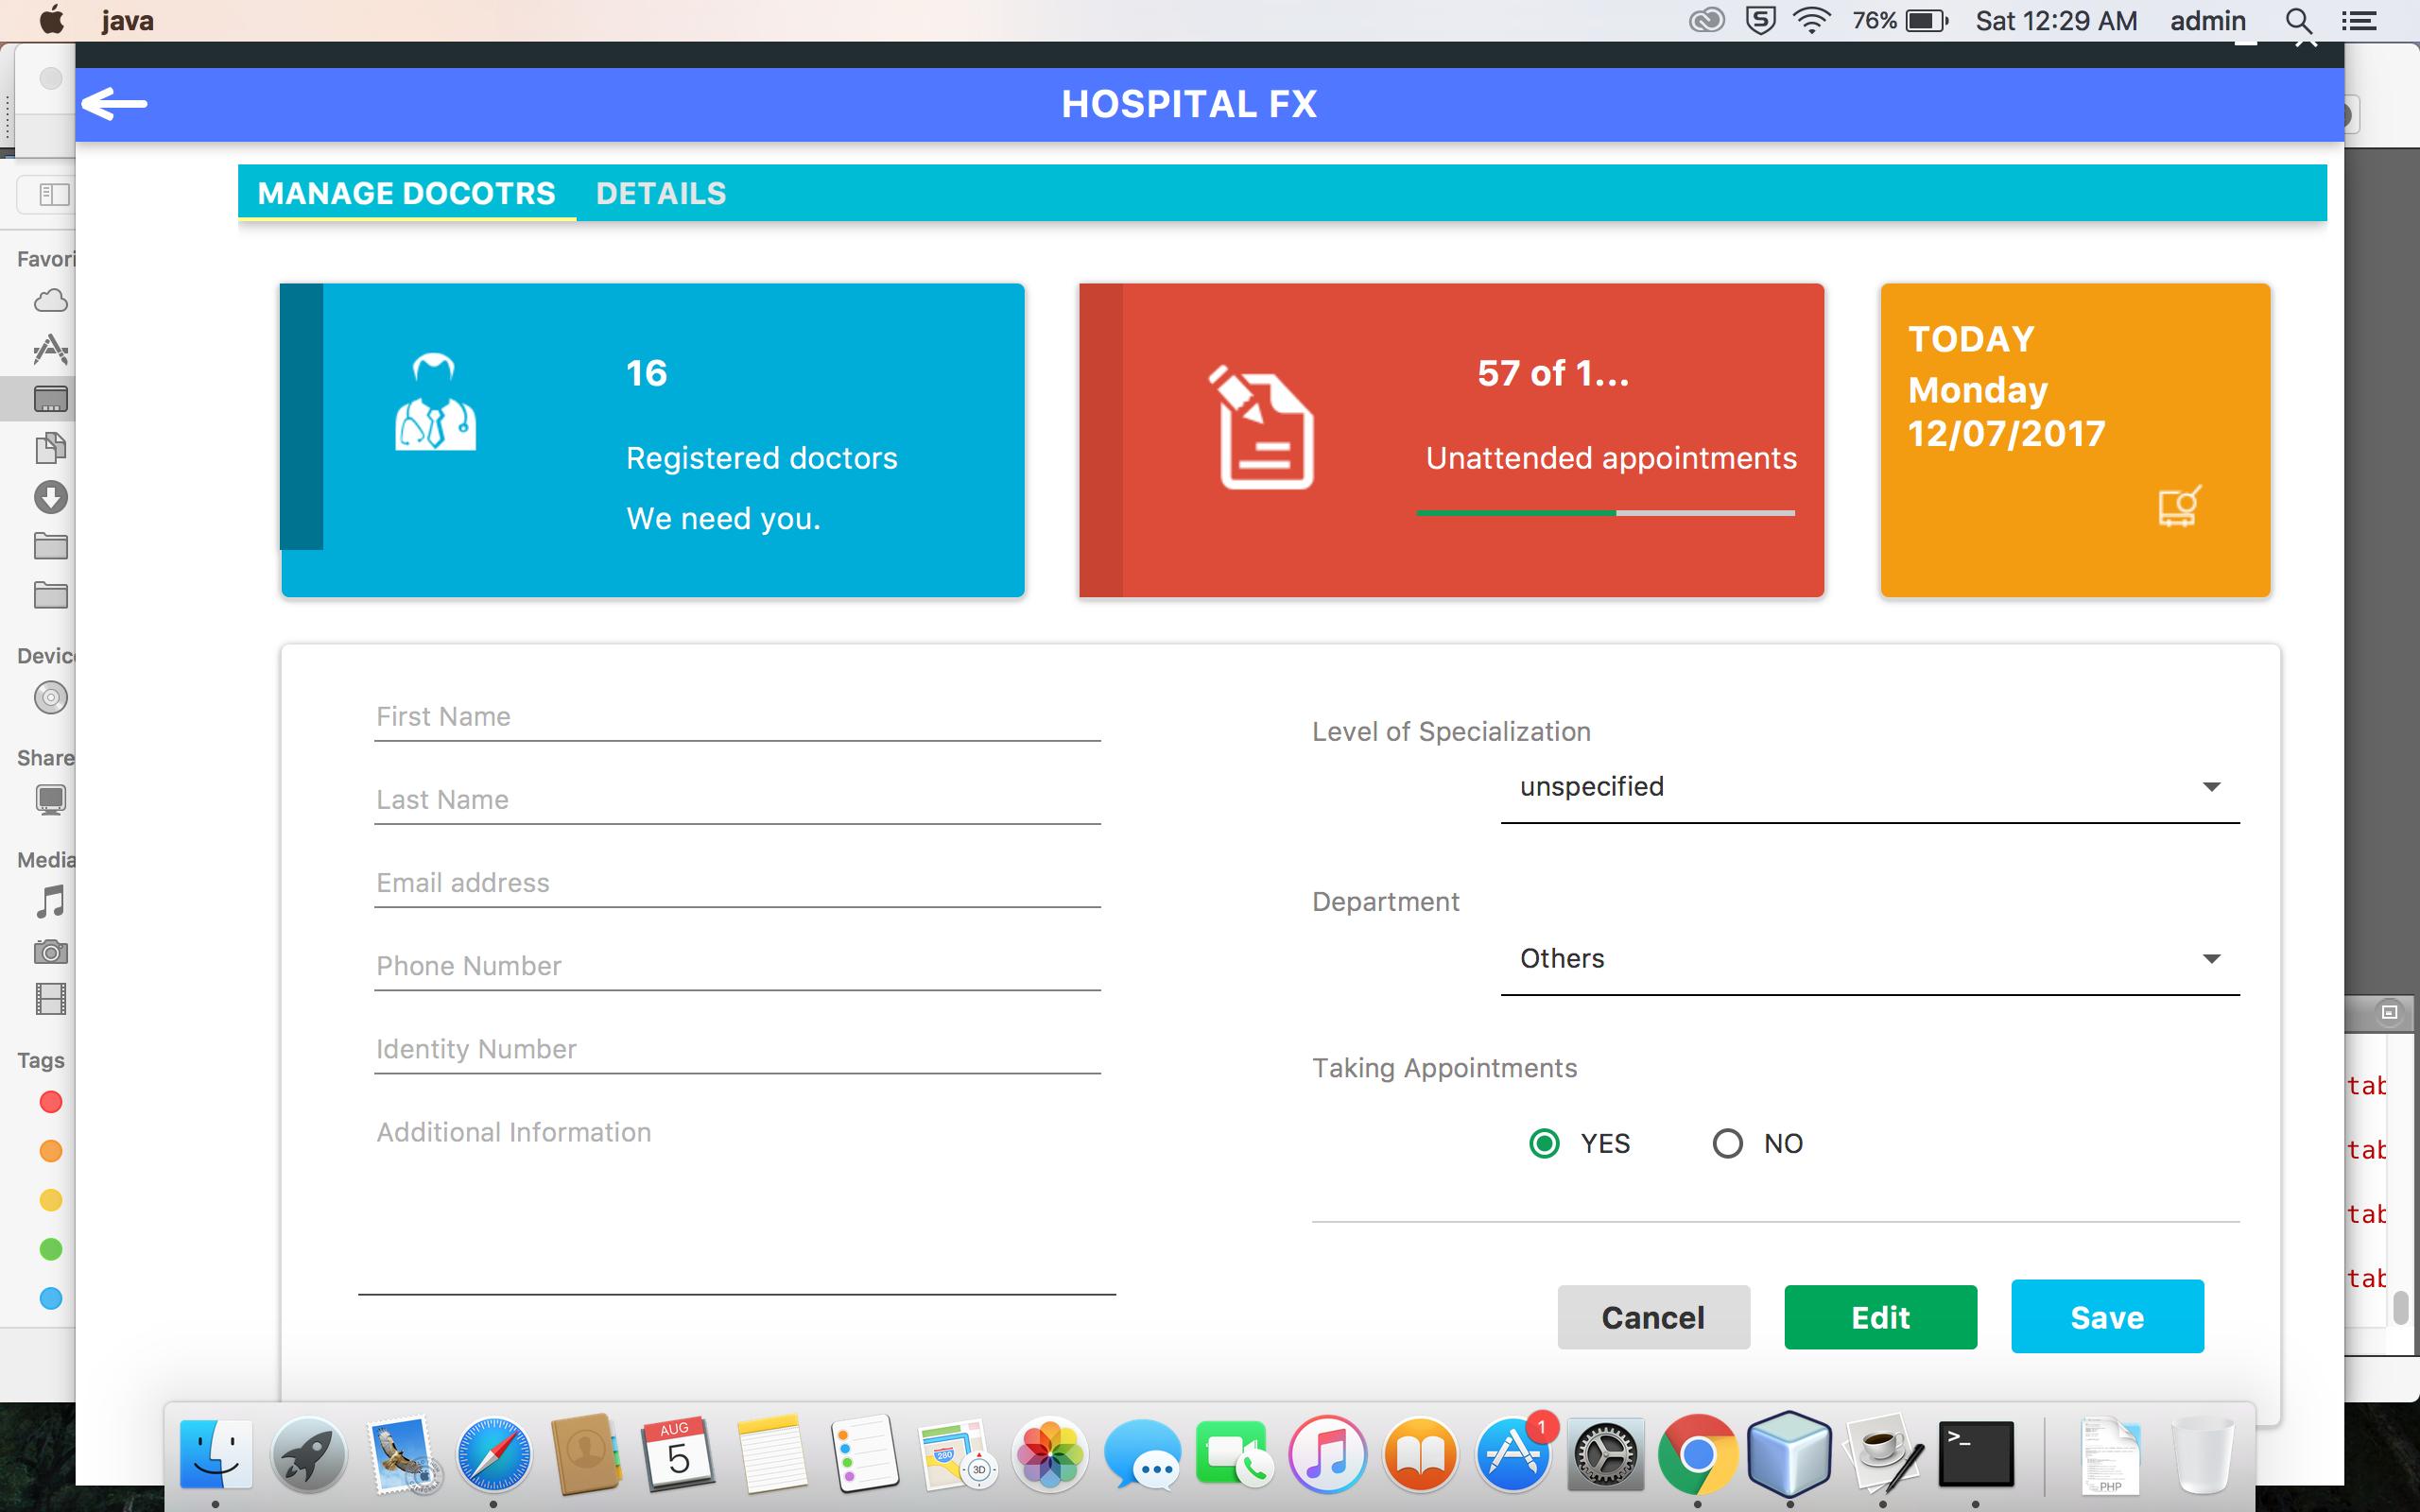 GitHub - ahmadsolehin/Hospital-Management-System-in-JAVAFX: JavaFx